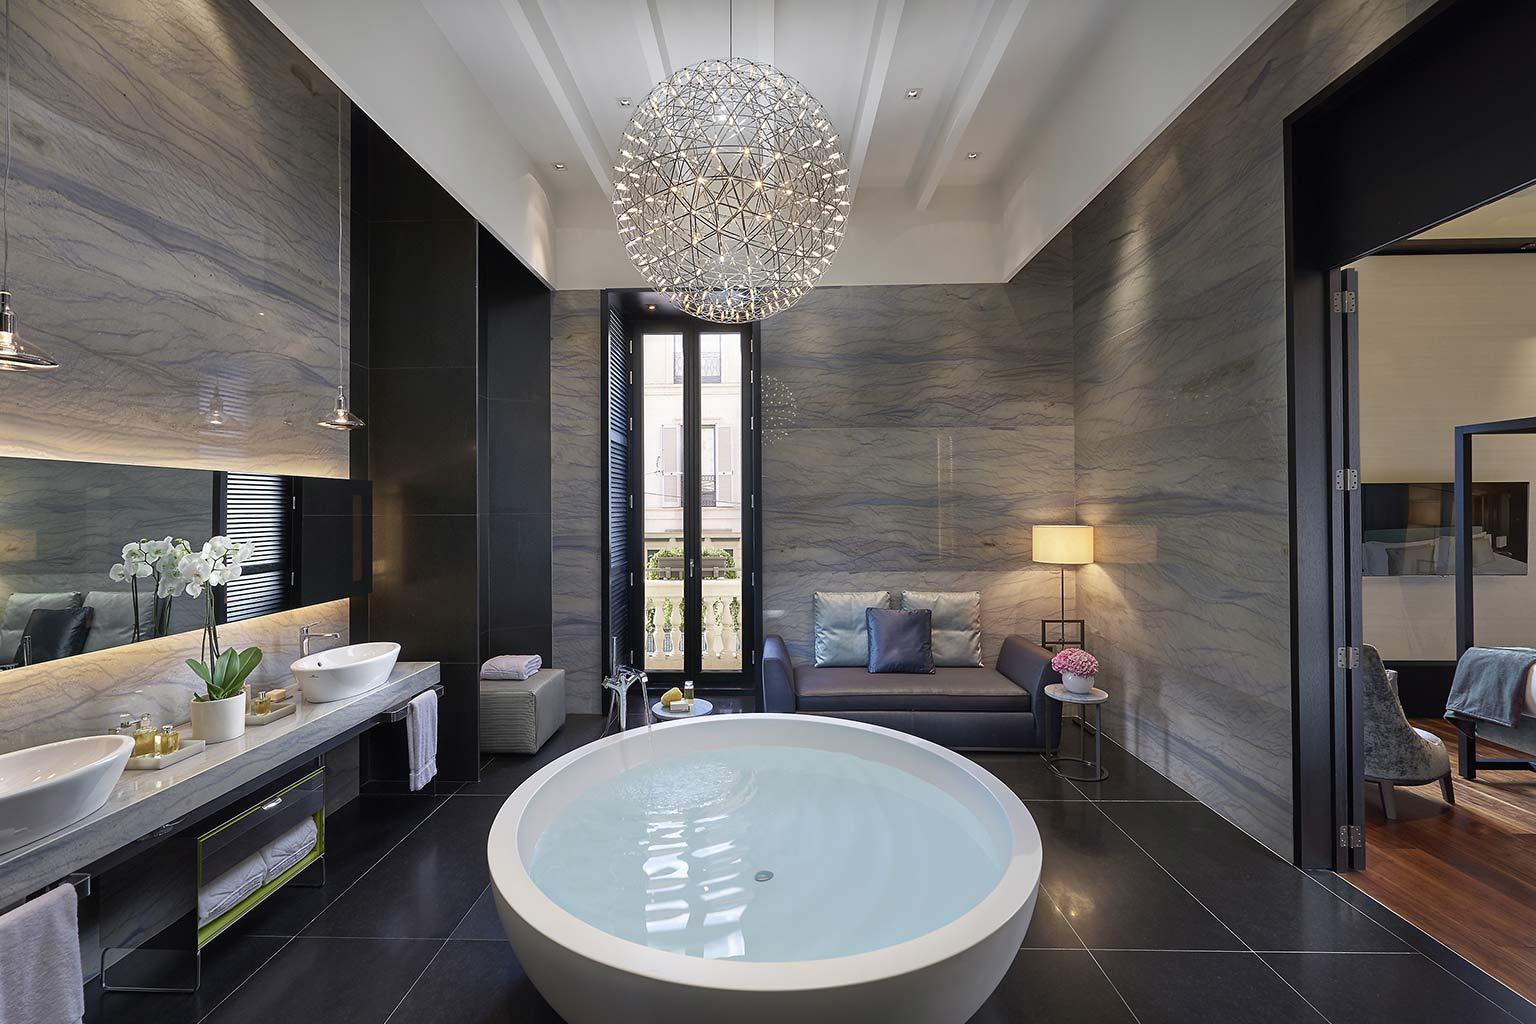 Badezimmer Exklusiv | Bnbnews.co